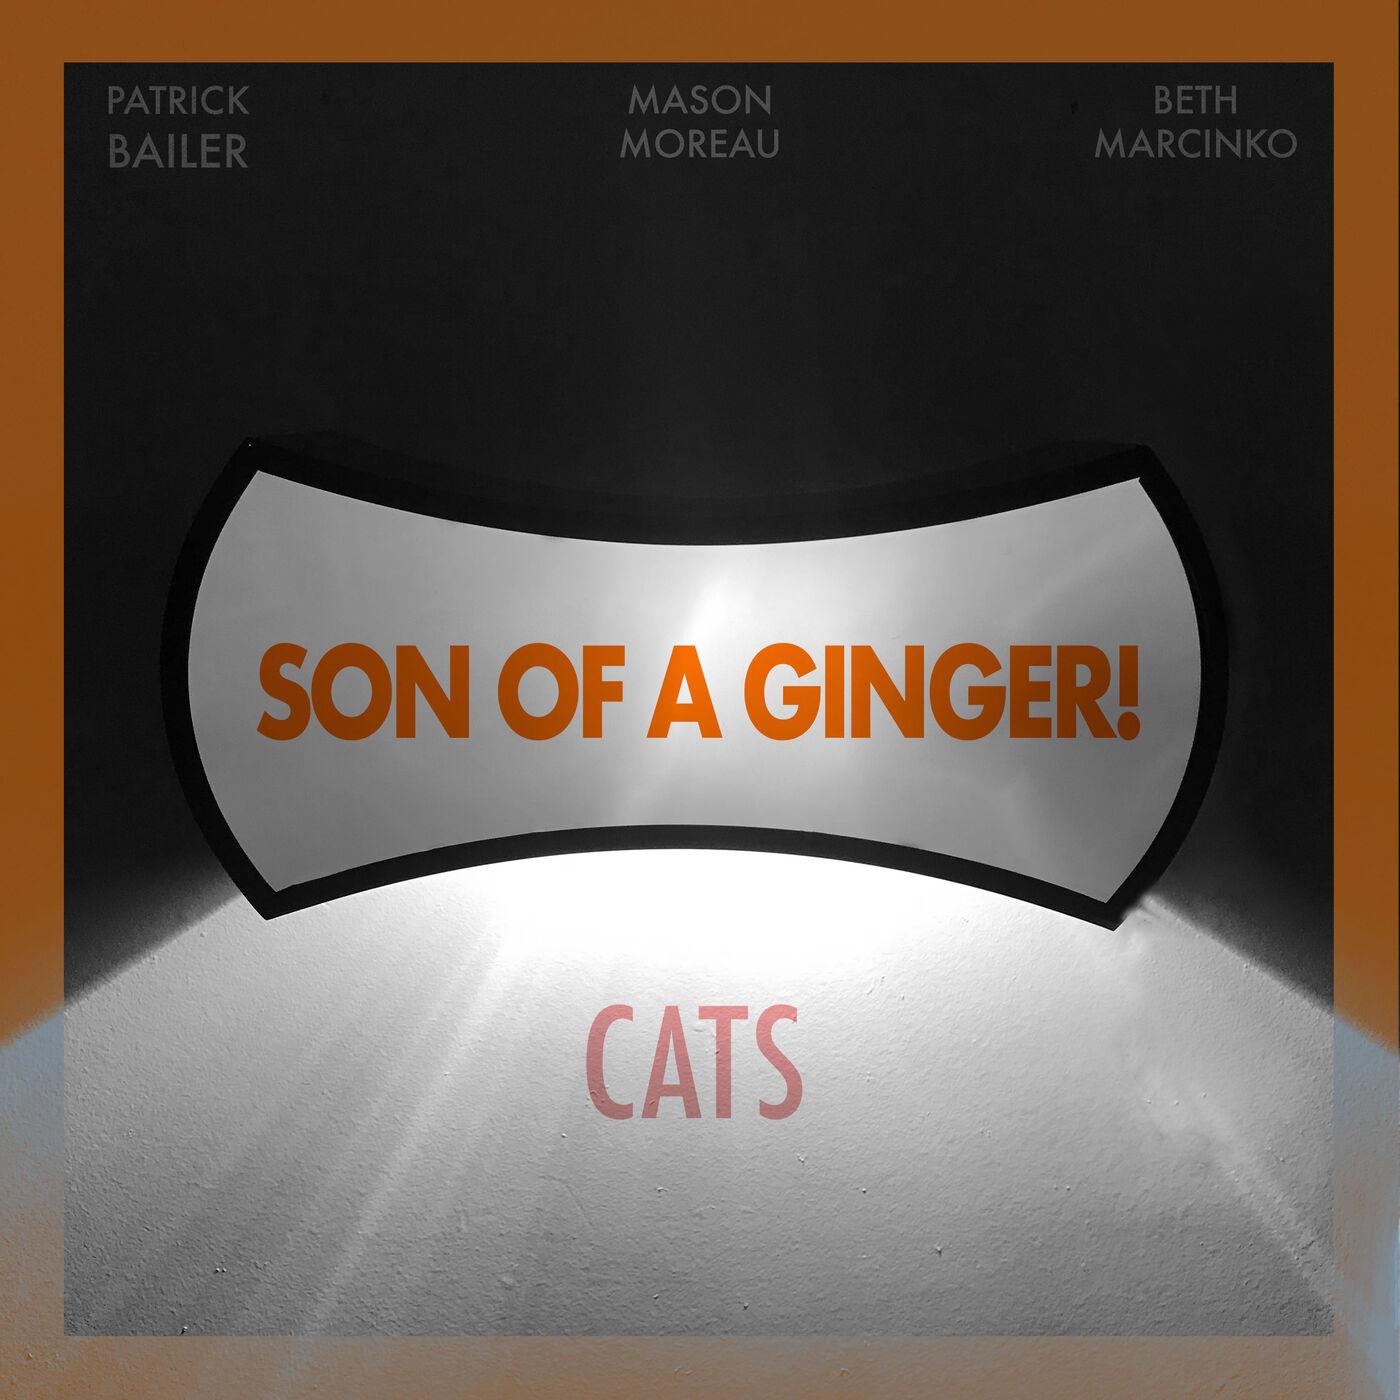 Cats (Dir. by Tom Hooper)